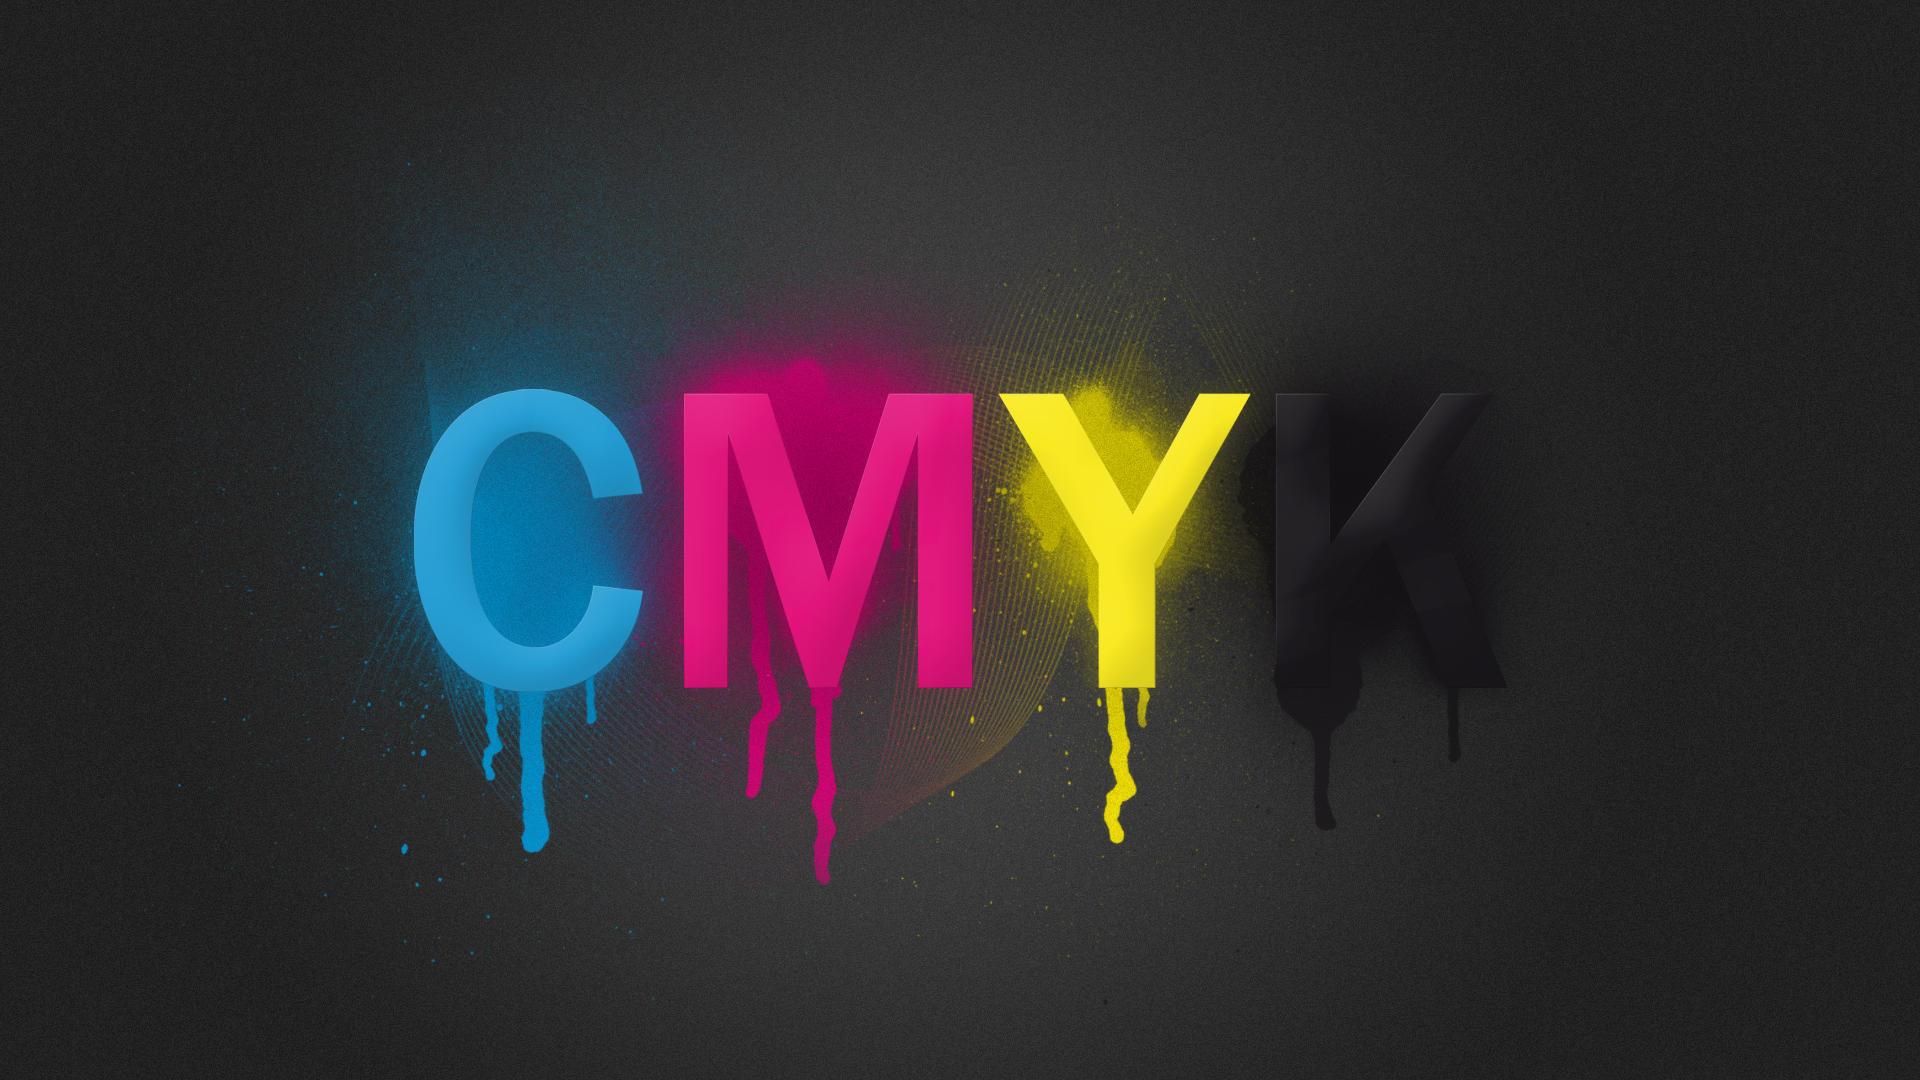 cmyk wallpaper 9 of - photo #31